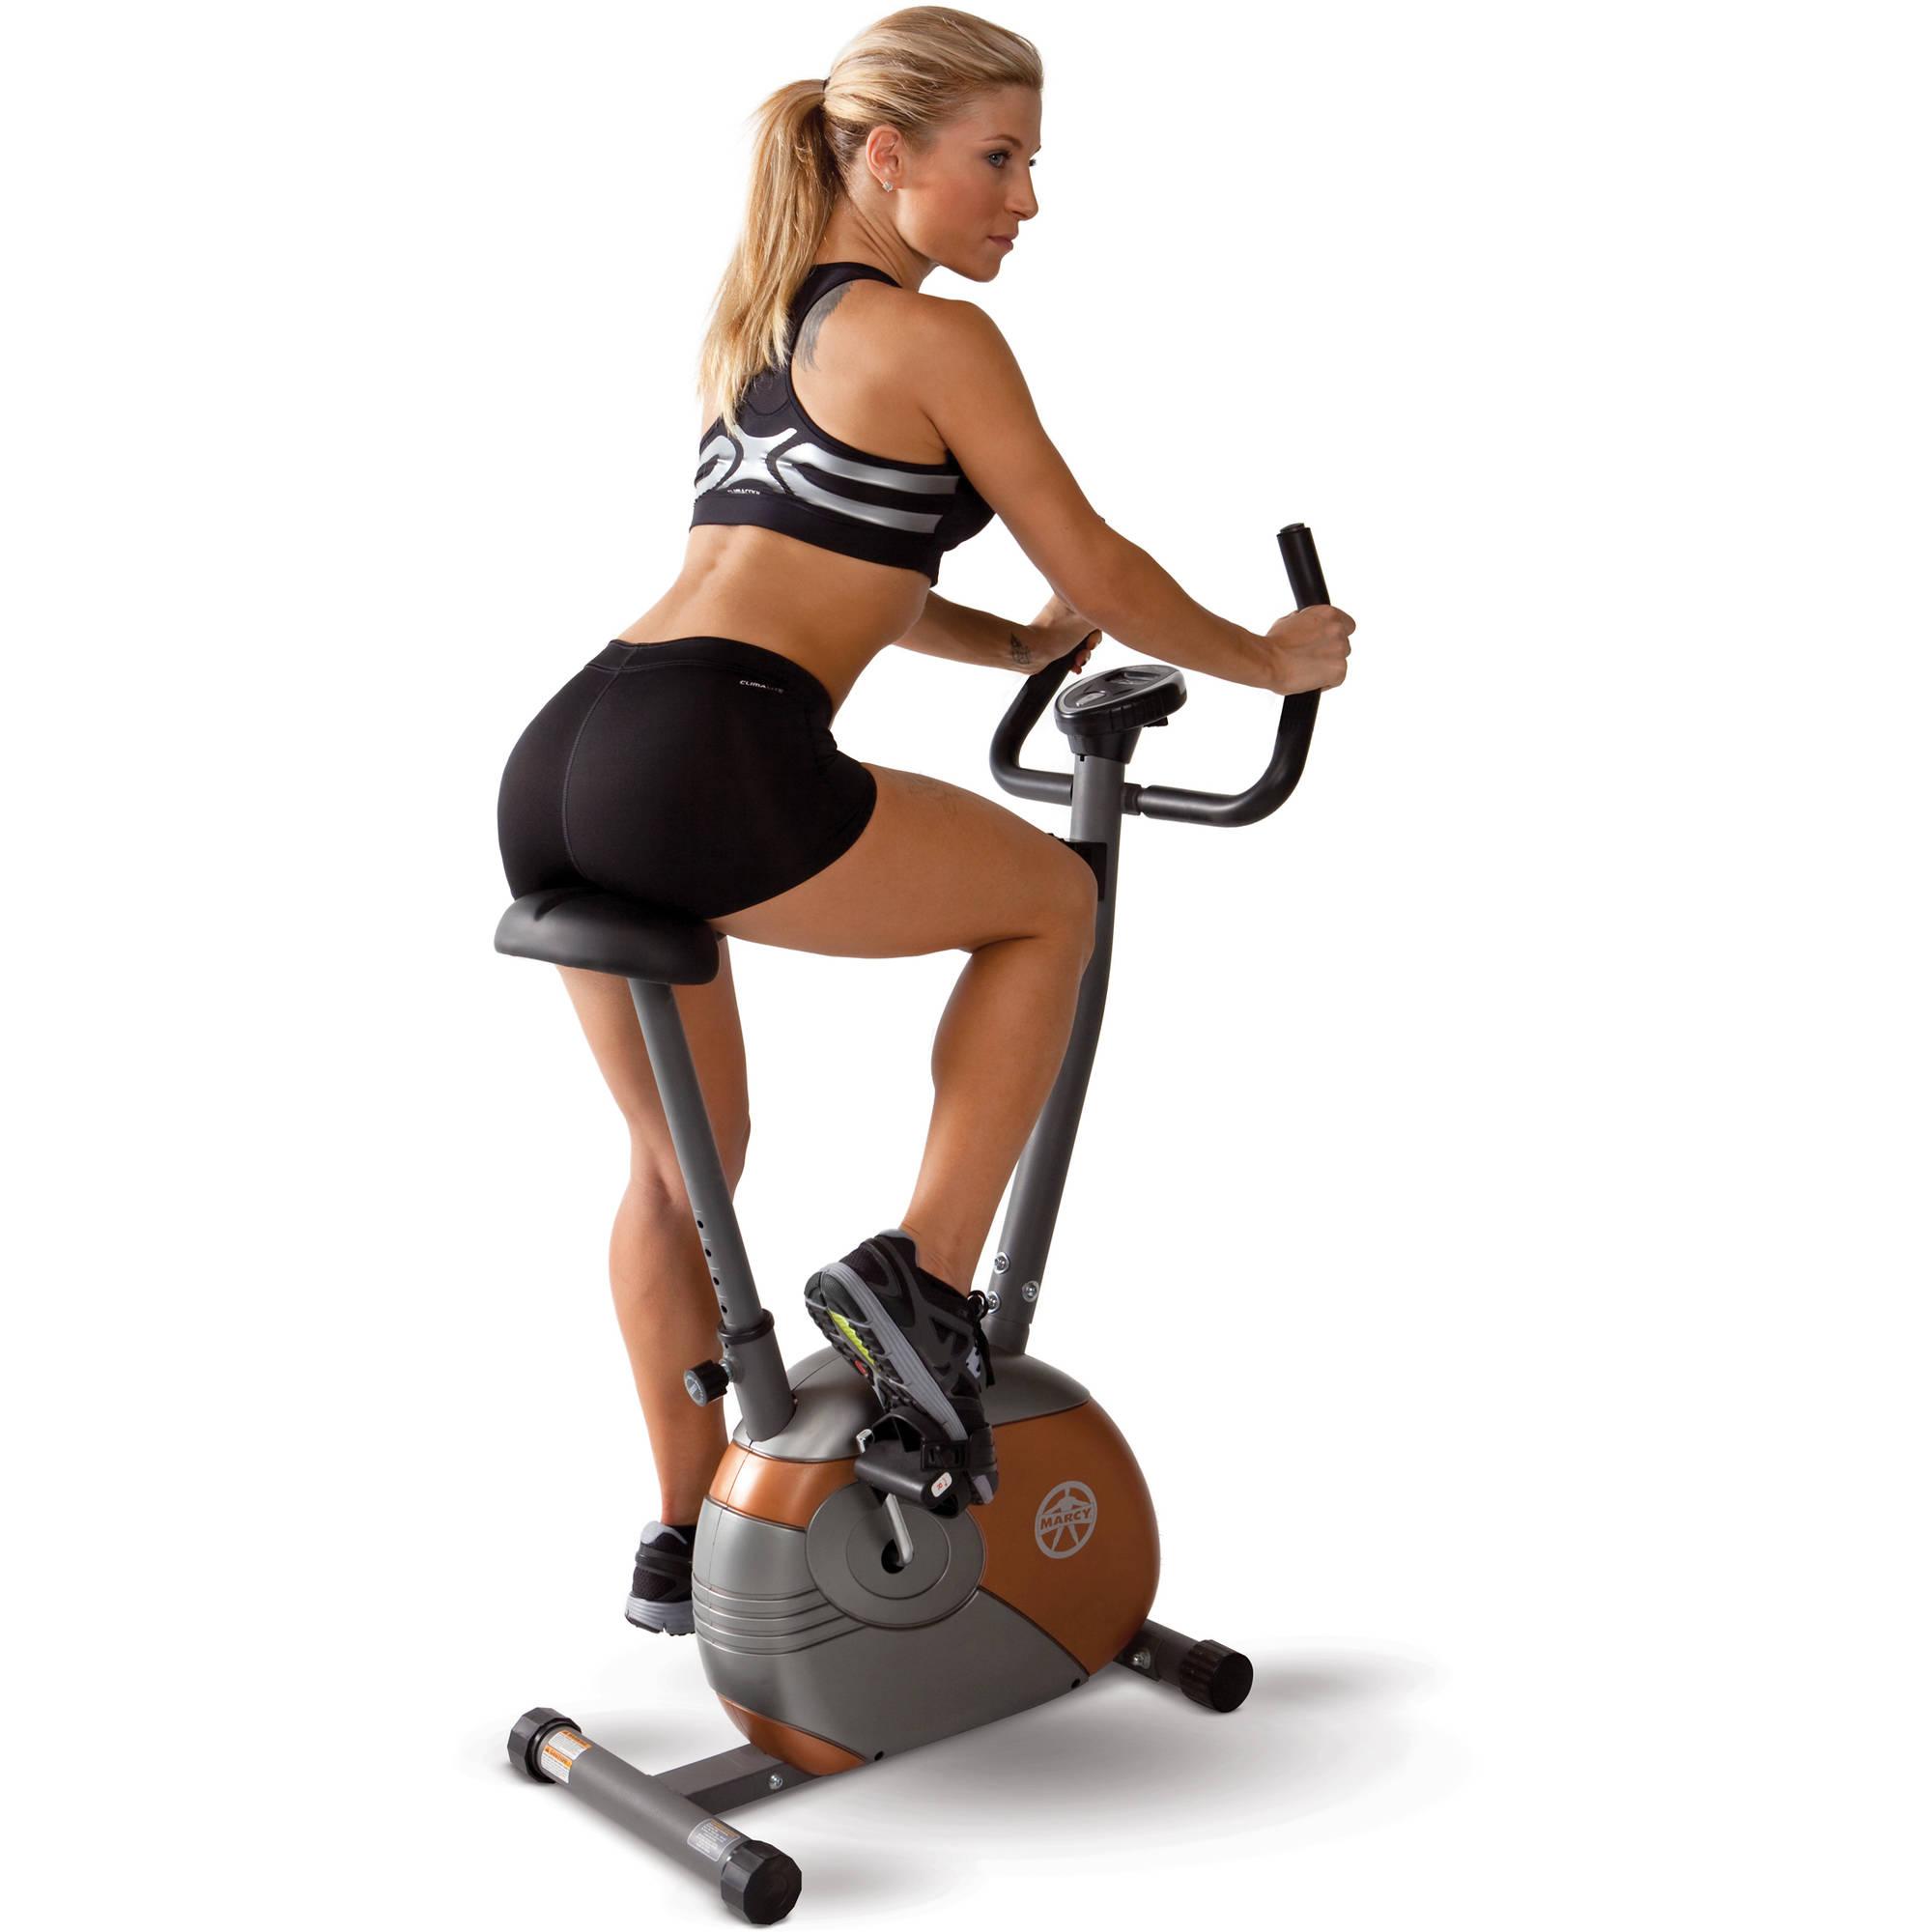 Marcy Upright Exercise Bike: ME-708